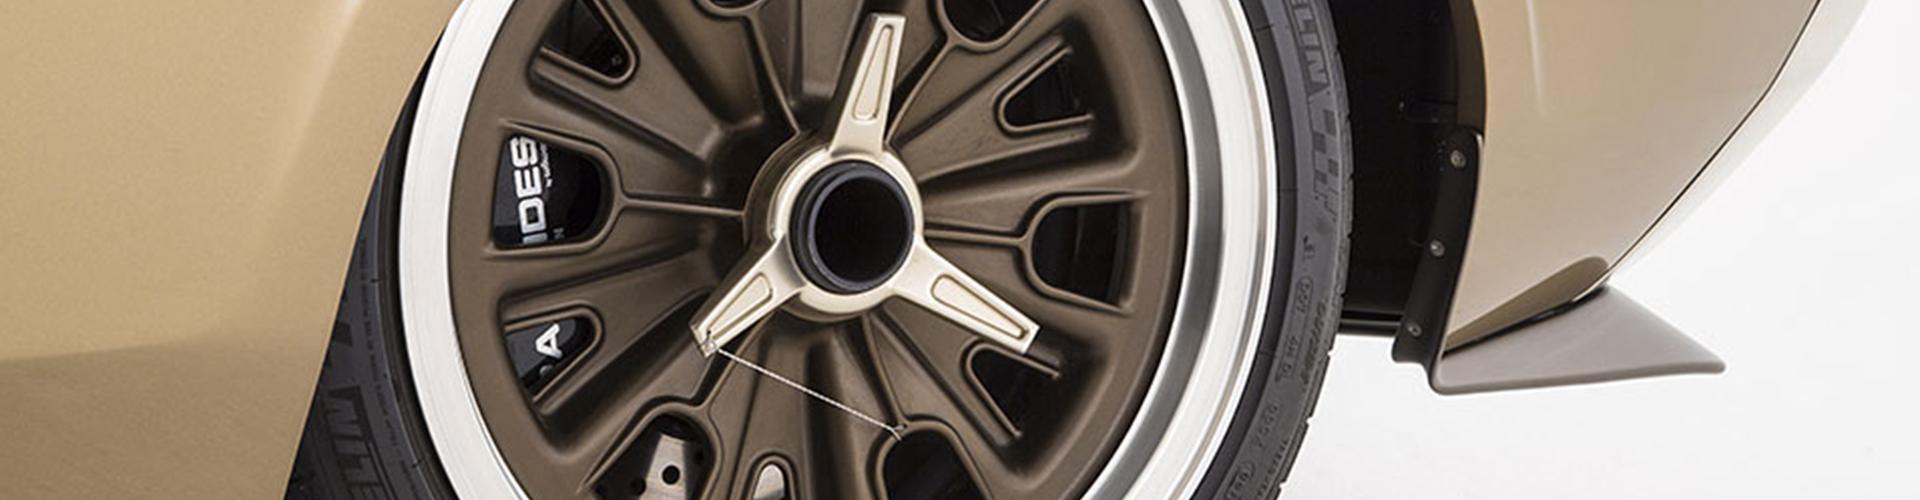 tirecare_closeup